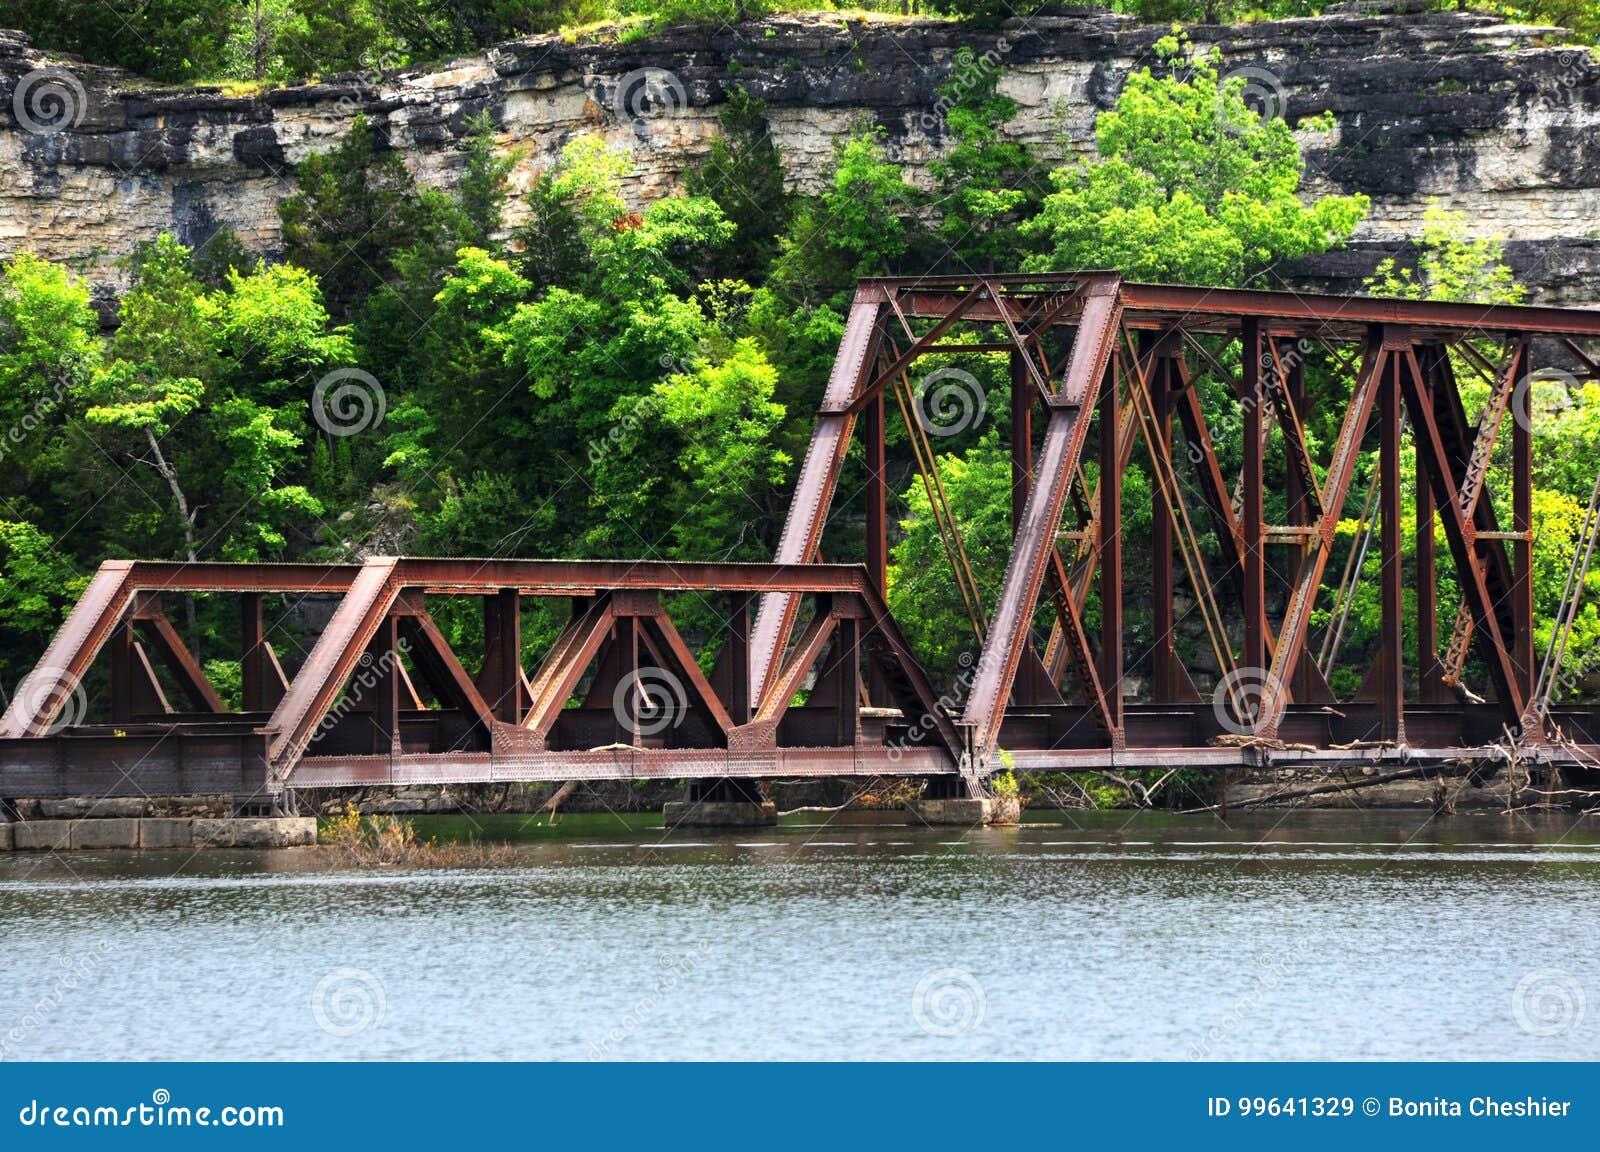 Download Arkansas Ozarks Railway Bridge Stock Image - Image of railray, white: 99641329